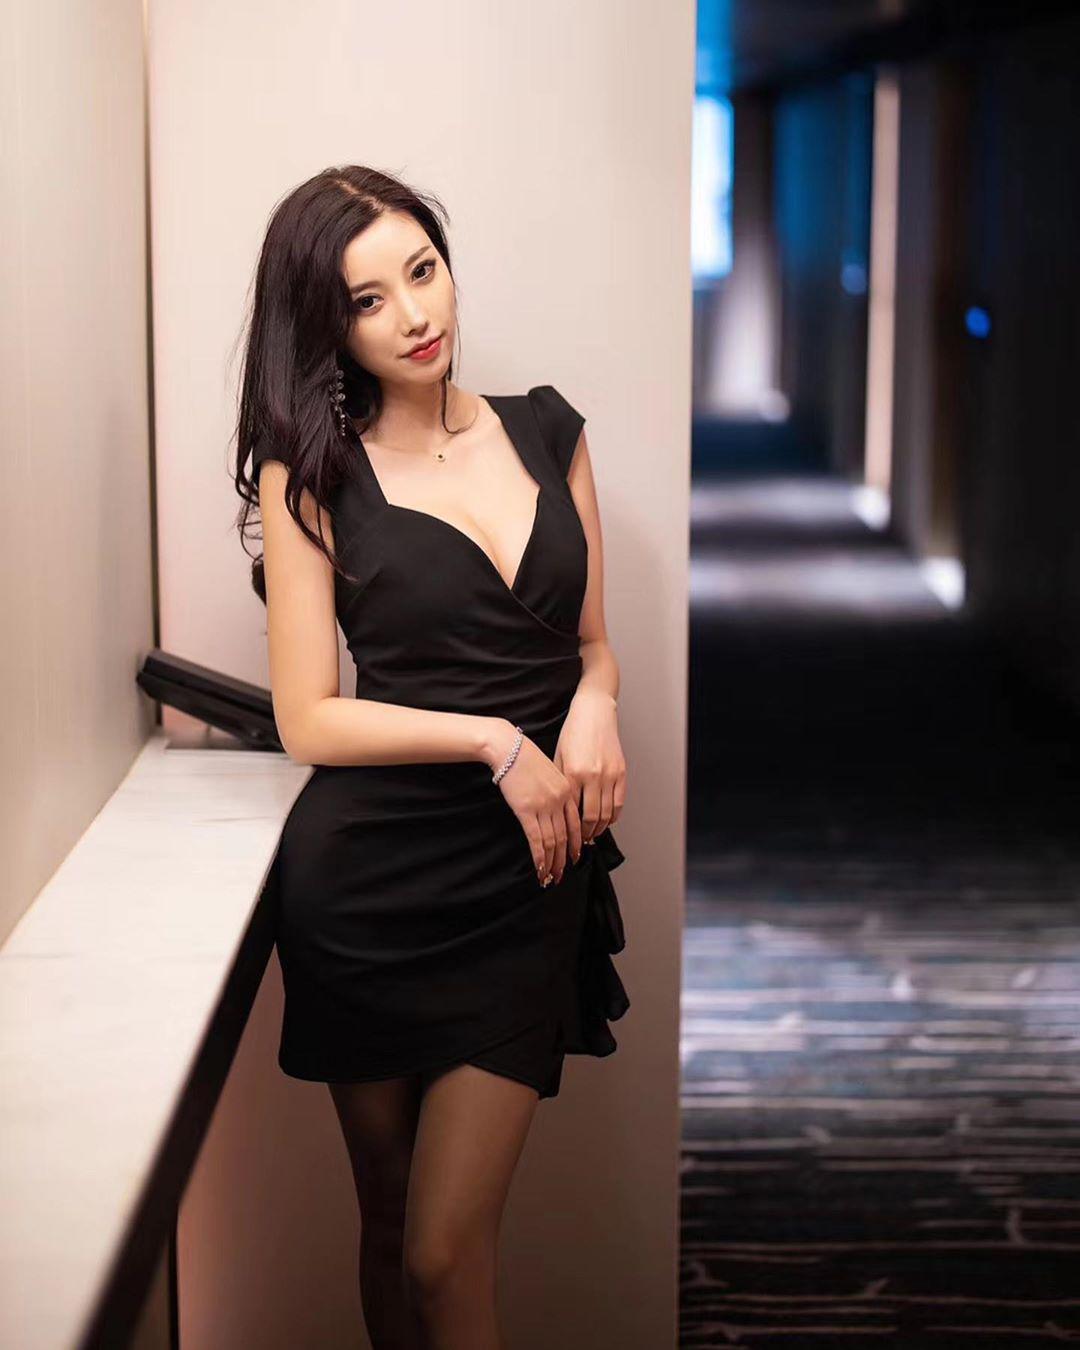 PBaPYxEf o - IG正妹—楊晨晨 (2)